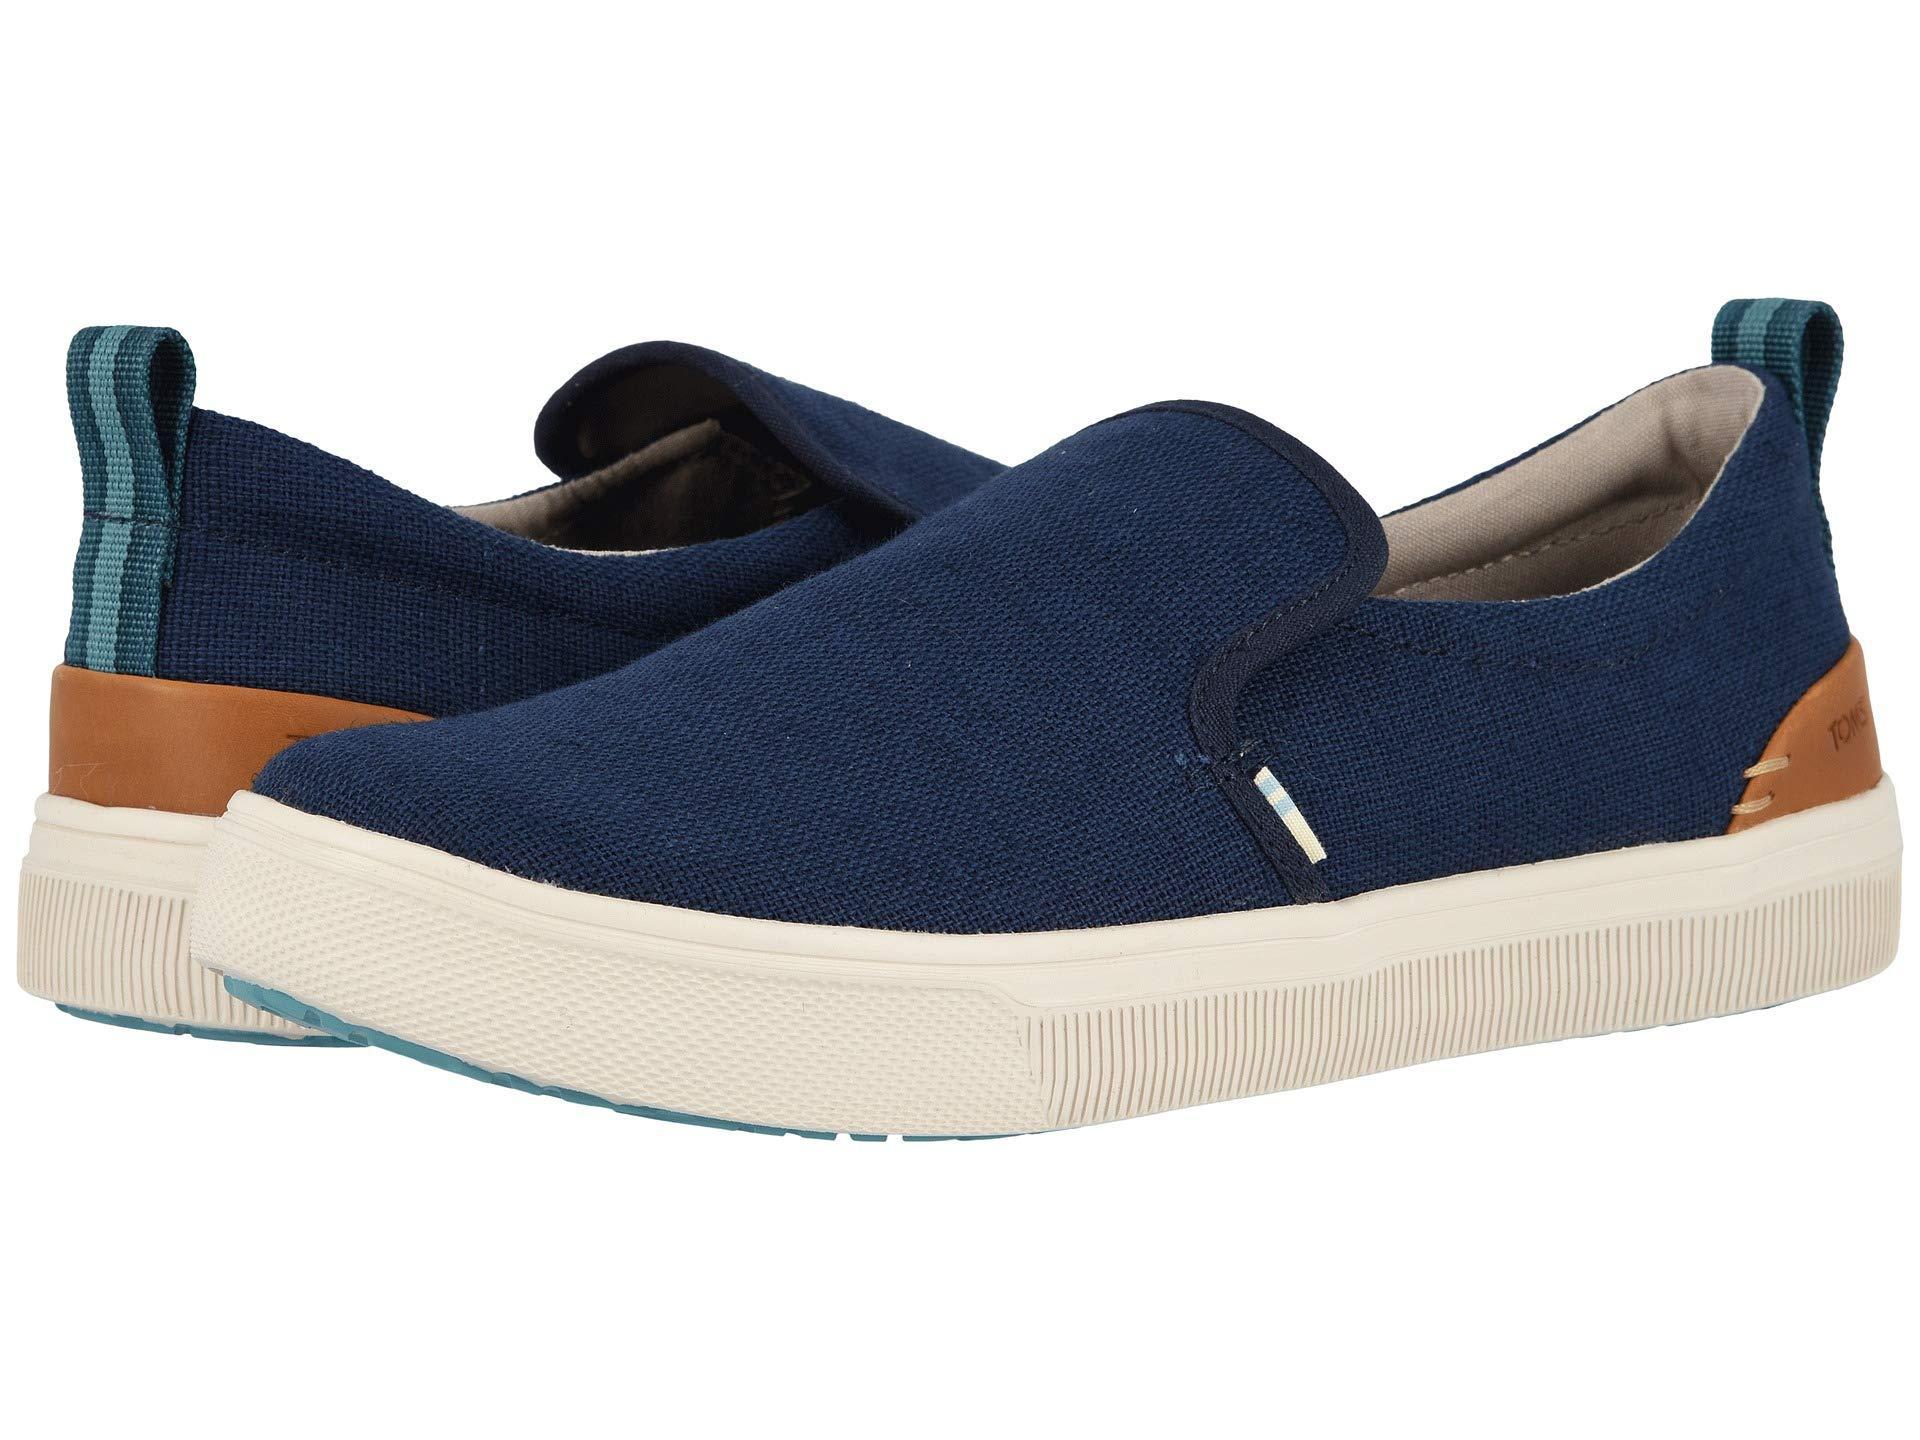 17fd1f8c5c3 Lyst - TOMS Men s Trvl Lite Canvas Slip-on Sneakers in Blue for Men ...